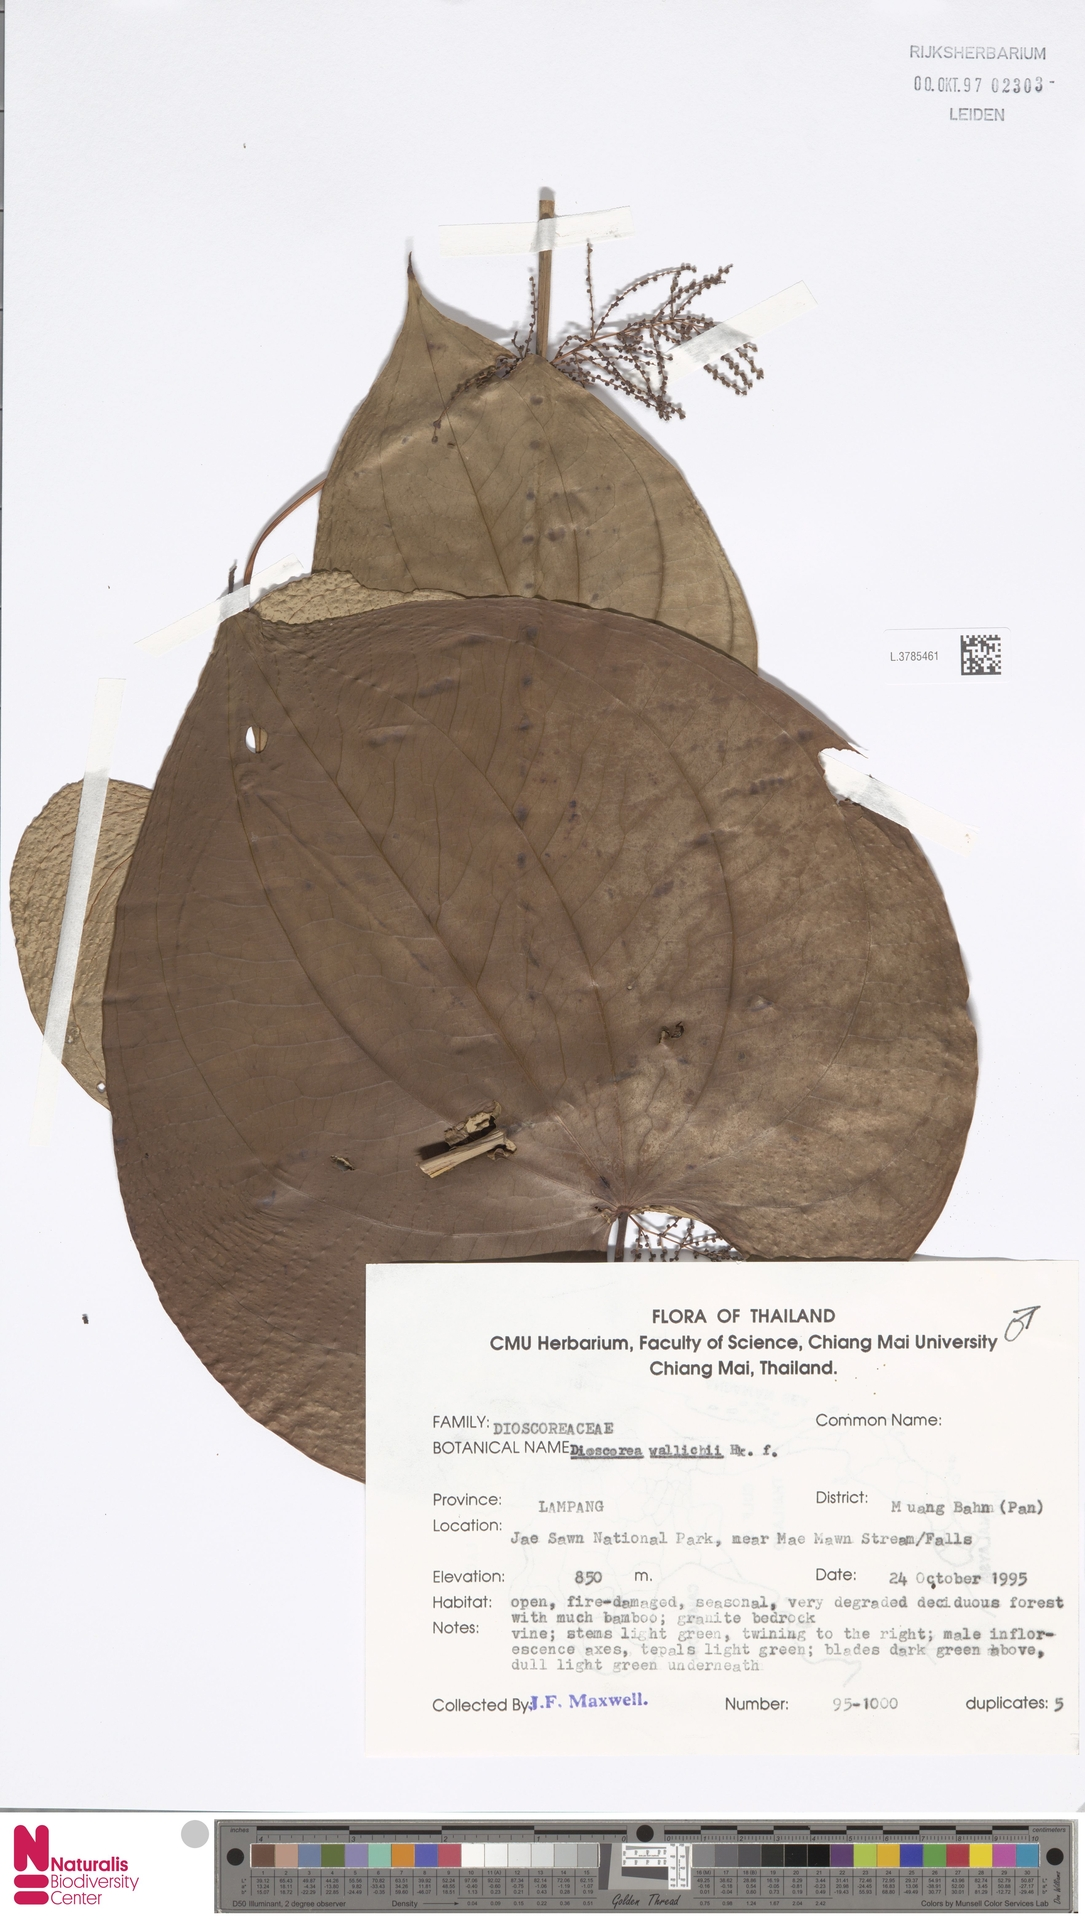 L.3785461 | Dioscorea wallichii Hook.f.